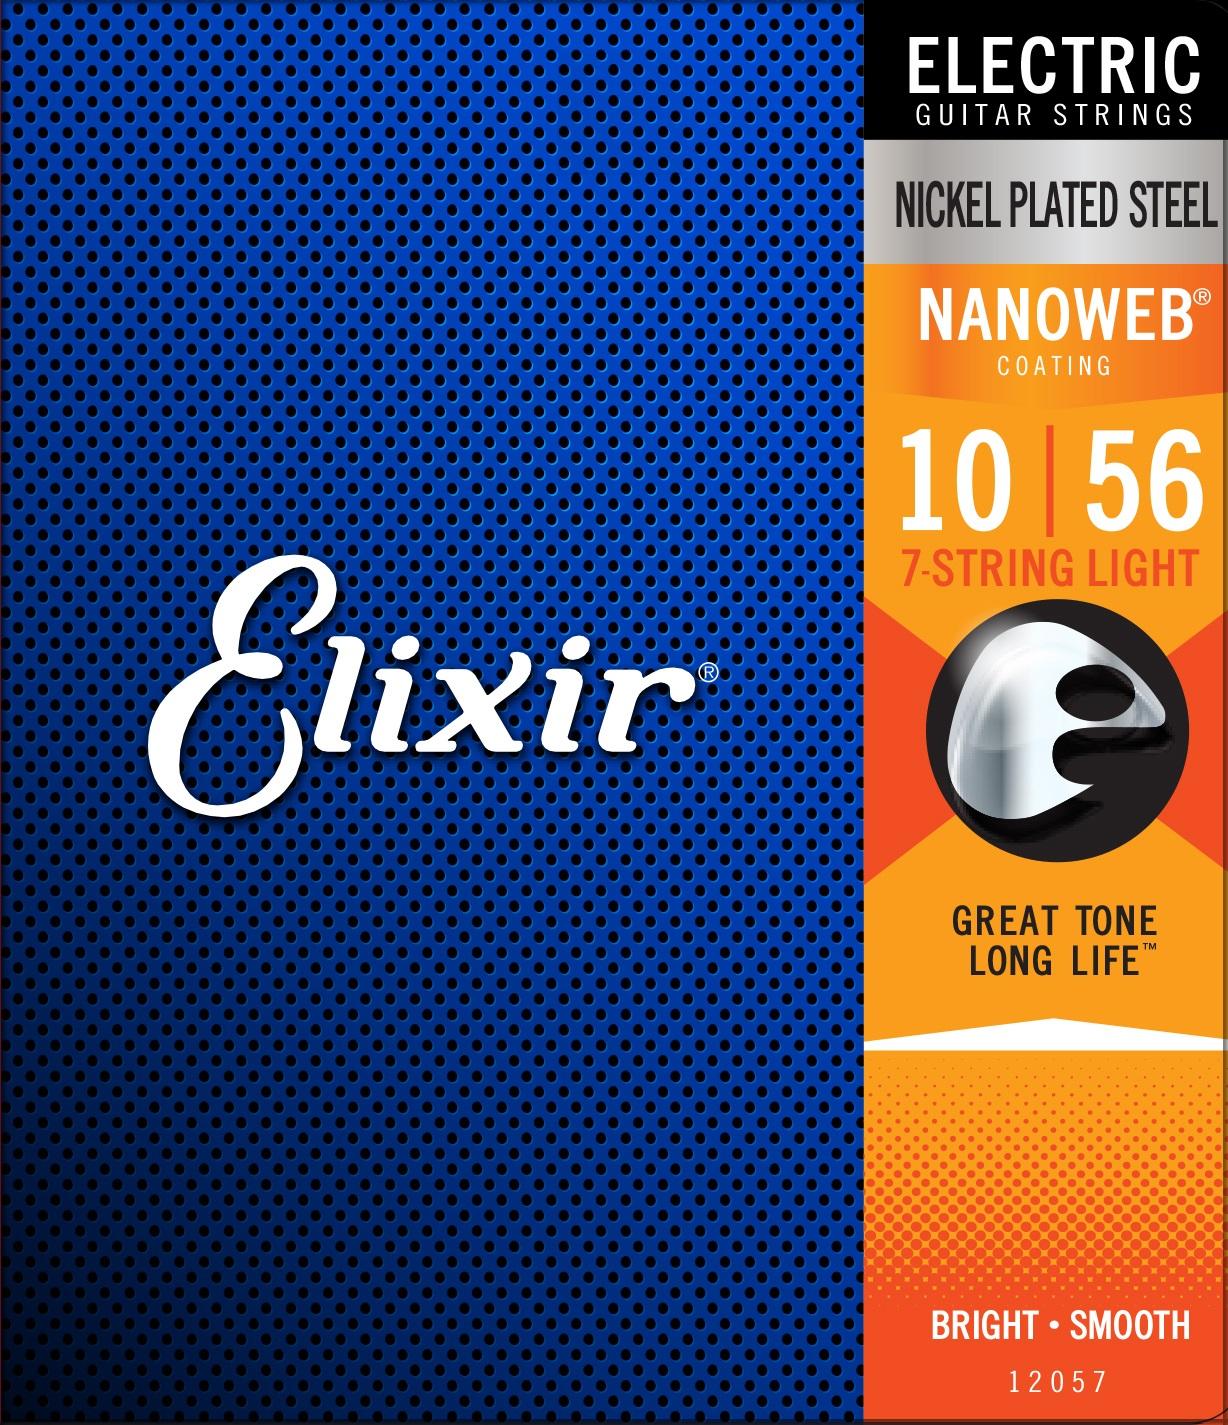 Elixir Nanoweb 7-String Light